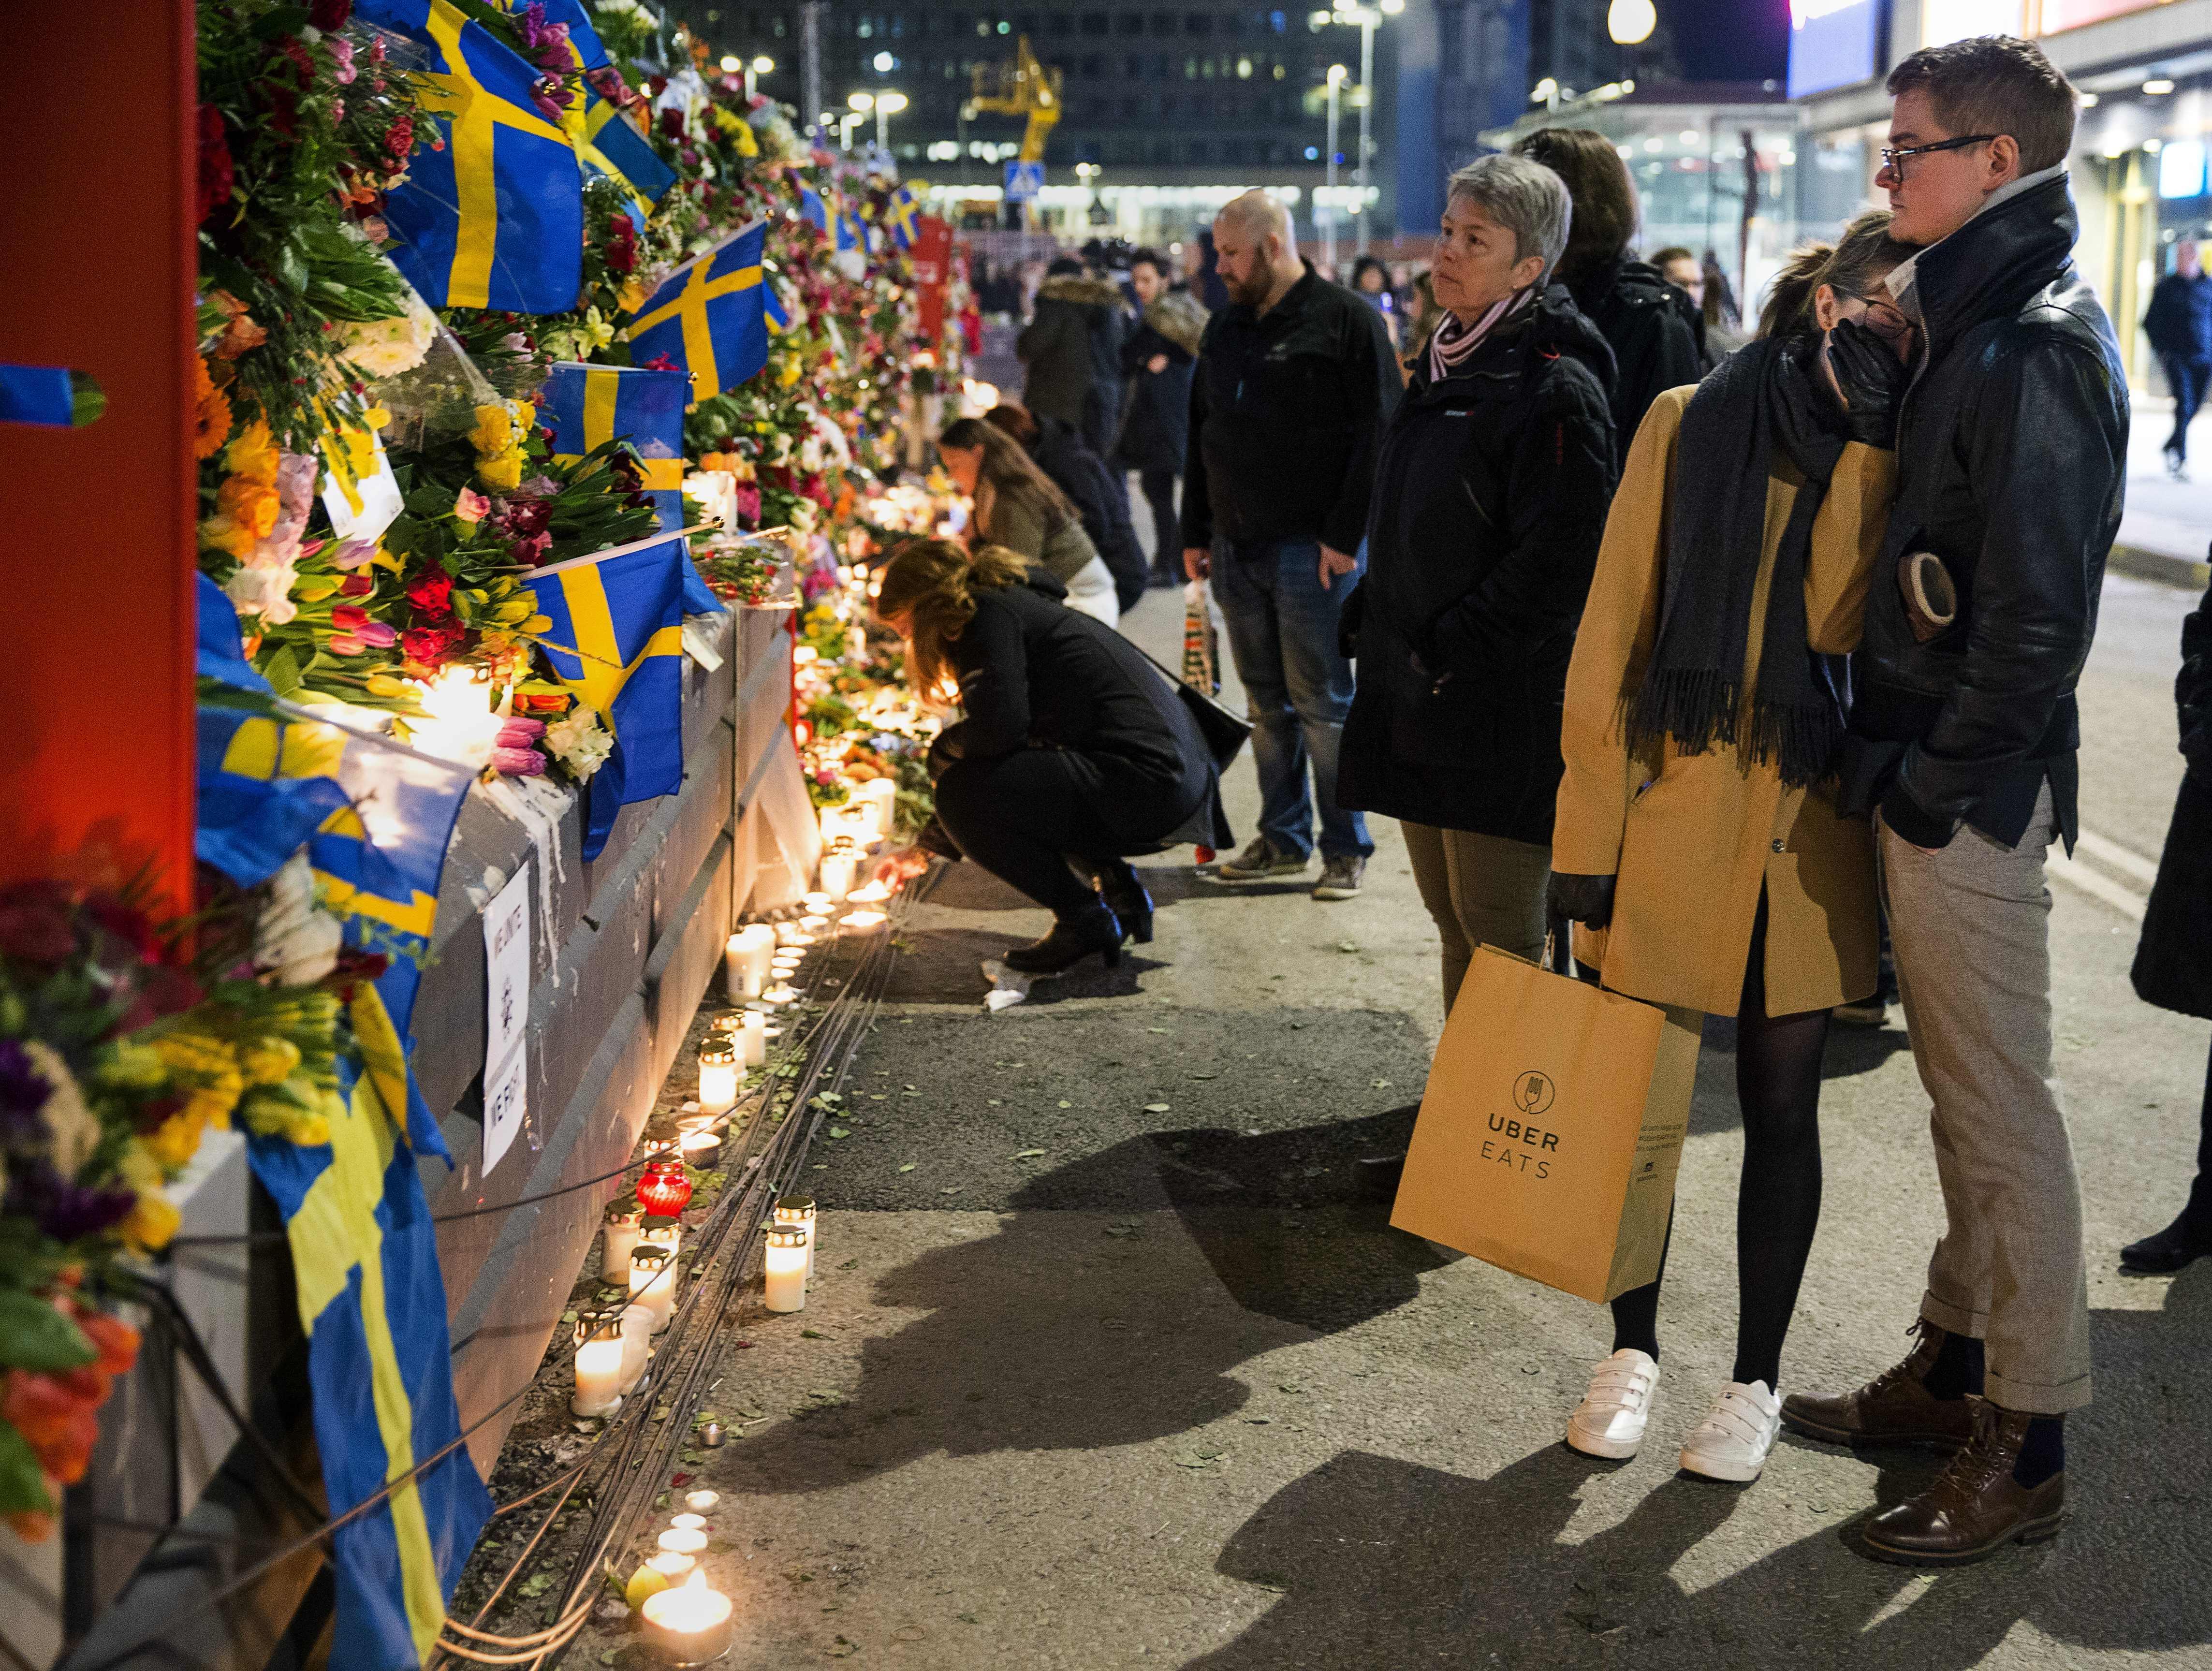 Terrorist Photo: Terrorist Attack Has Sweden Questioning Immigration Policy